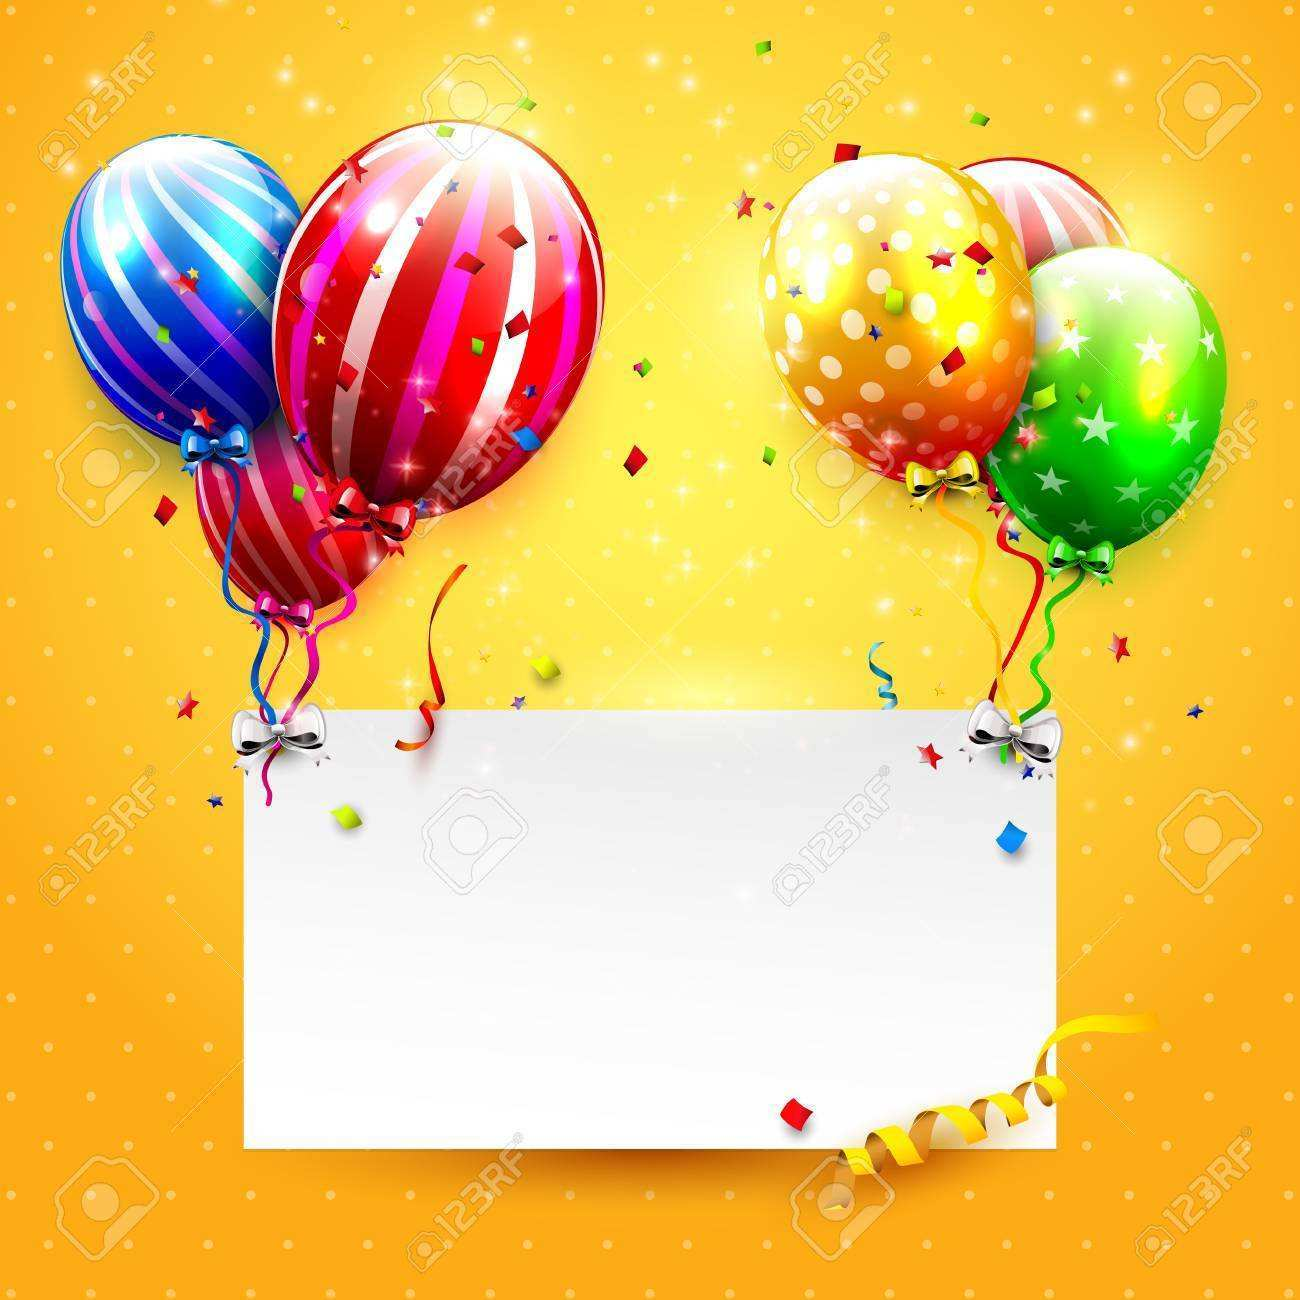 27 Creating Birthday Invitation Template Balloons Now by Birthday Invitation Template Balloons